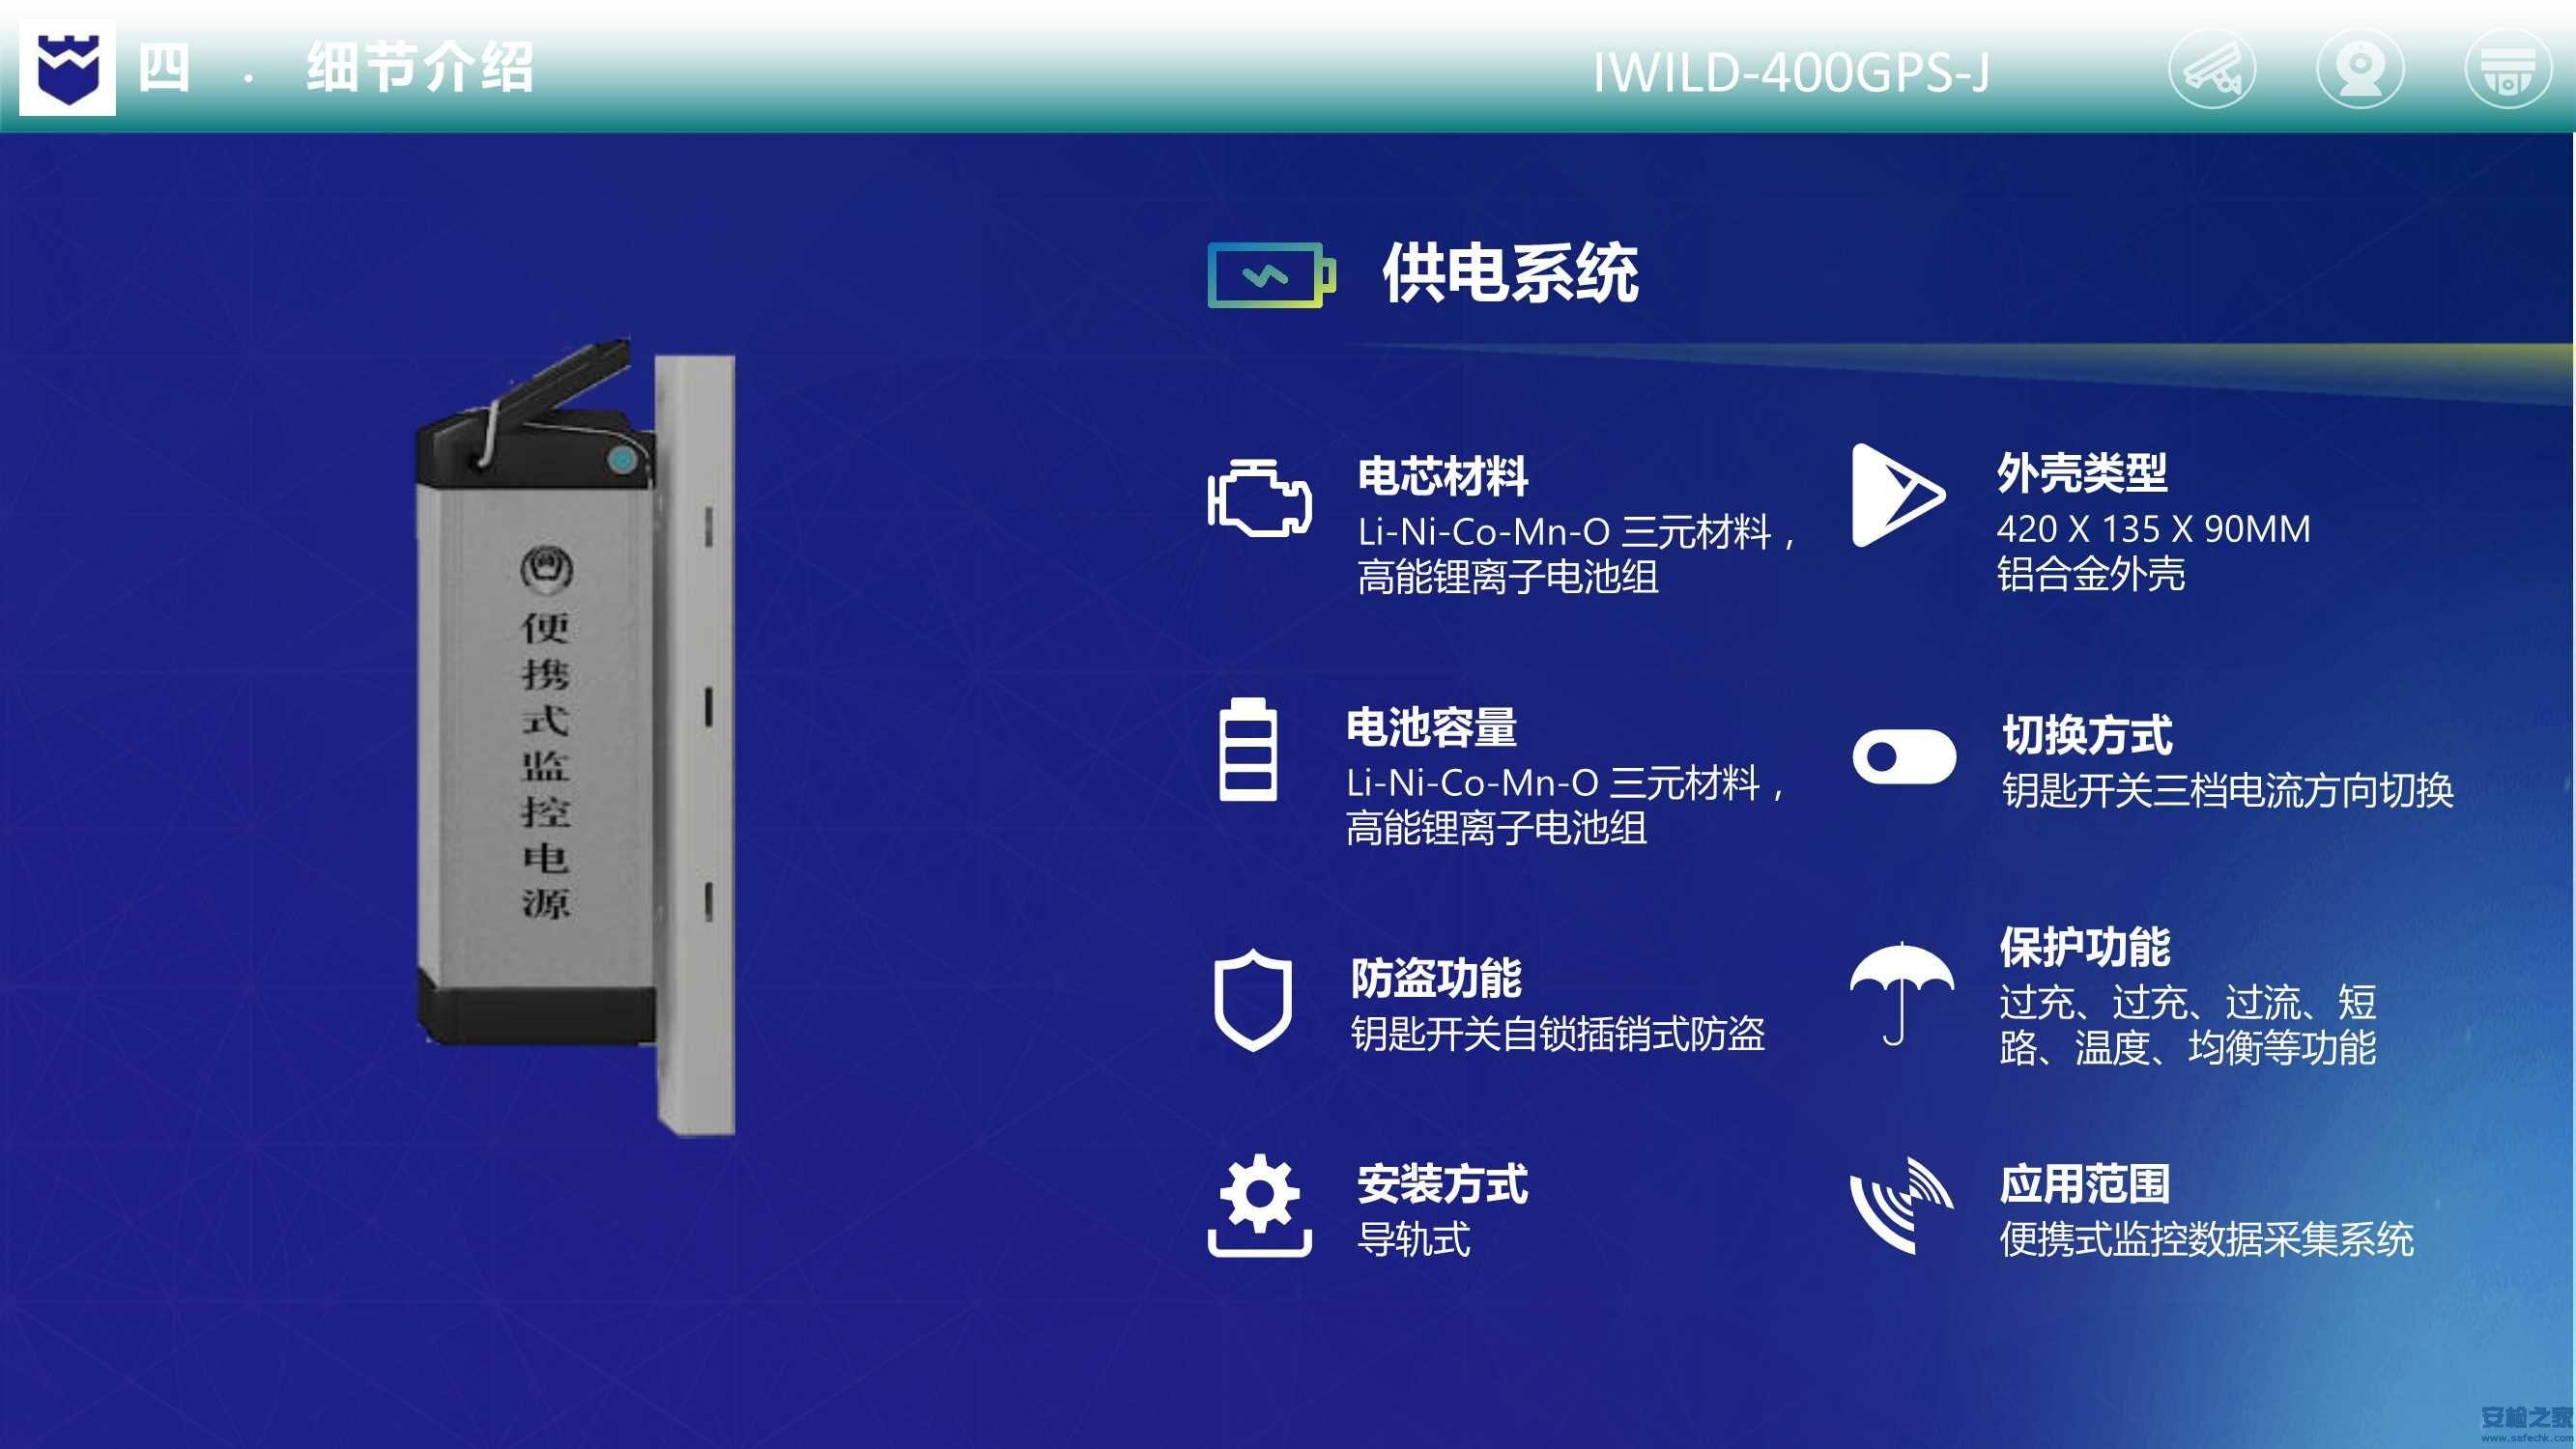 IWILD-400GPS-J便携式监控布防系统_7.Jpg